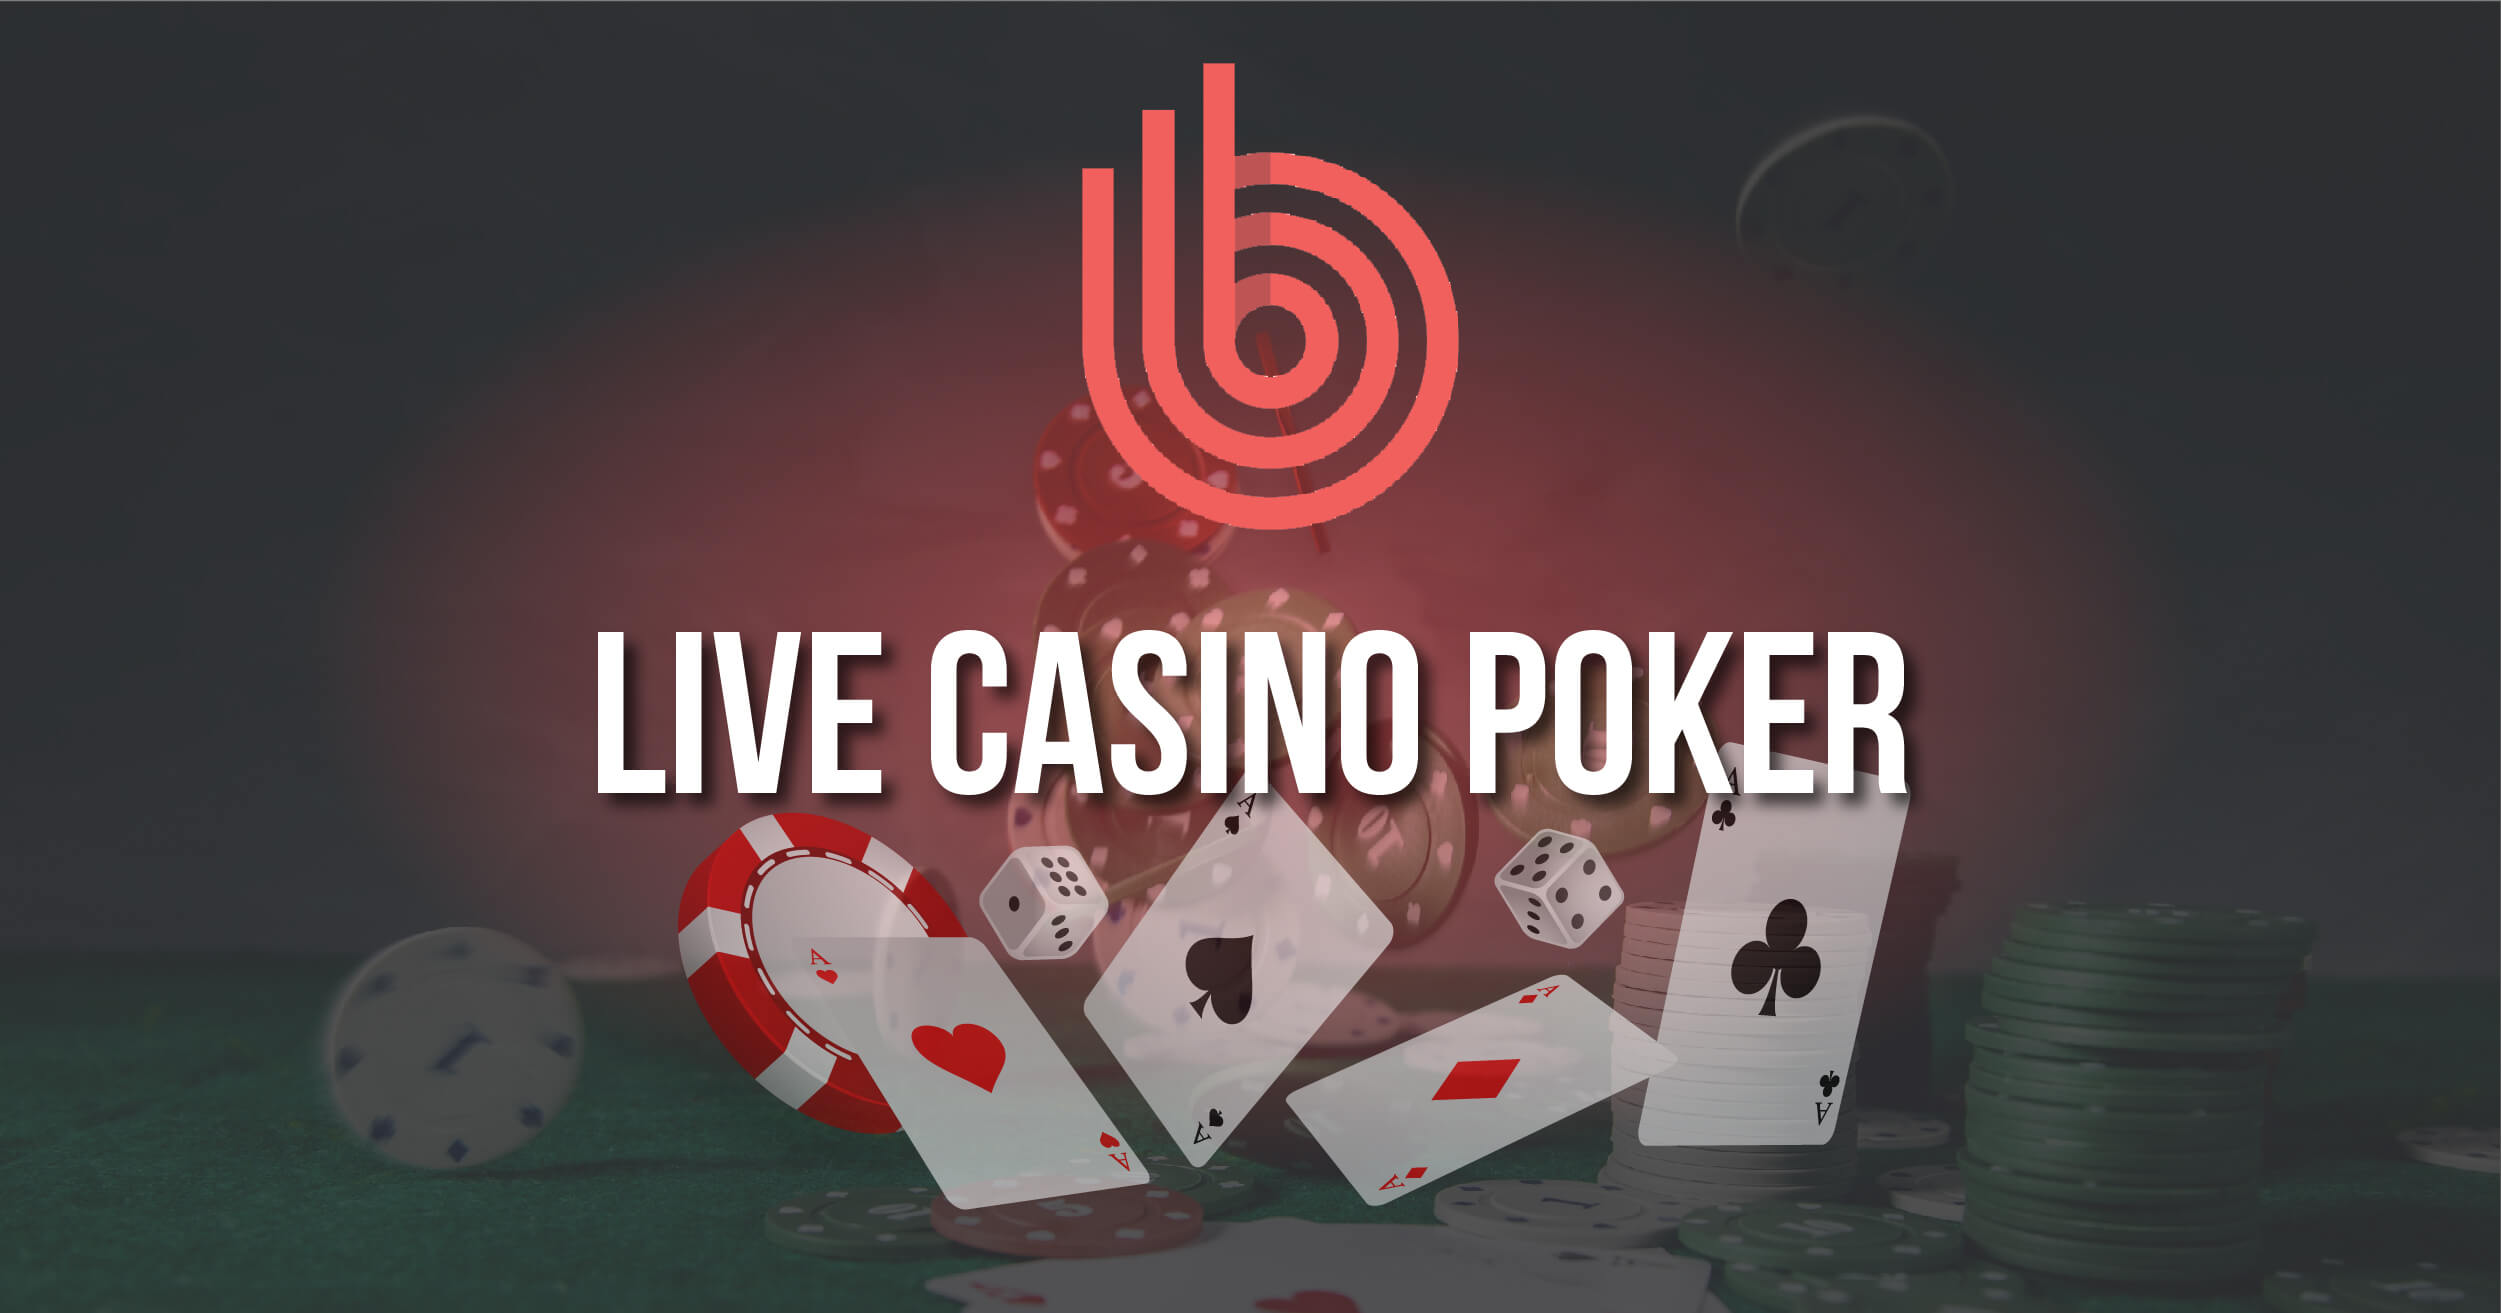 Live Casino Poker Review